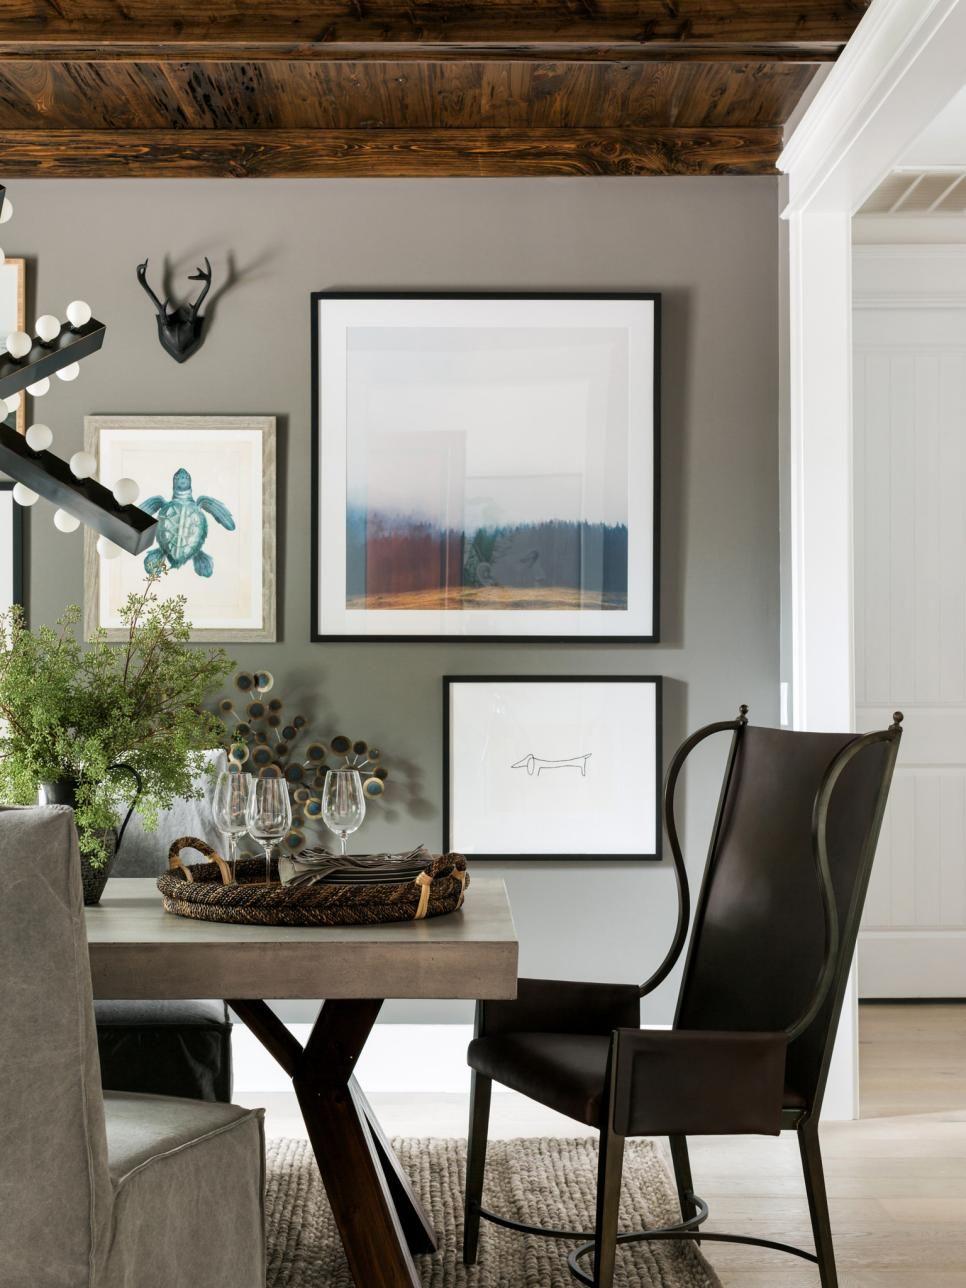 Hgtv Dream Home 2017 Dining Room Pictures Http Www Hgtv Com